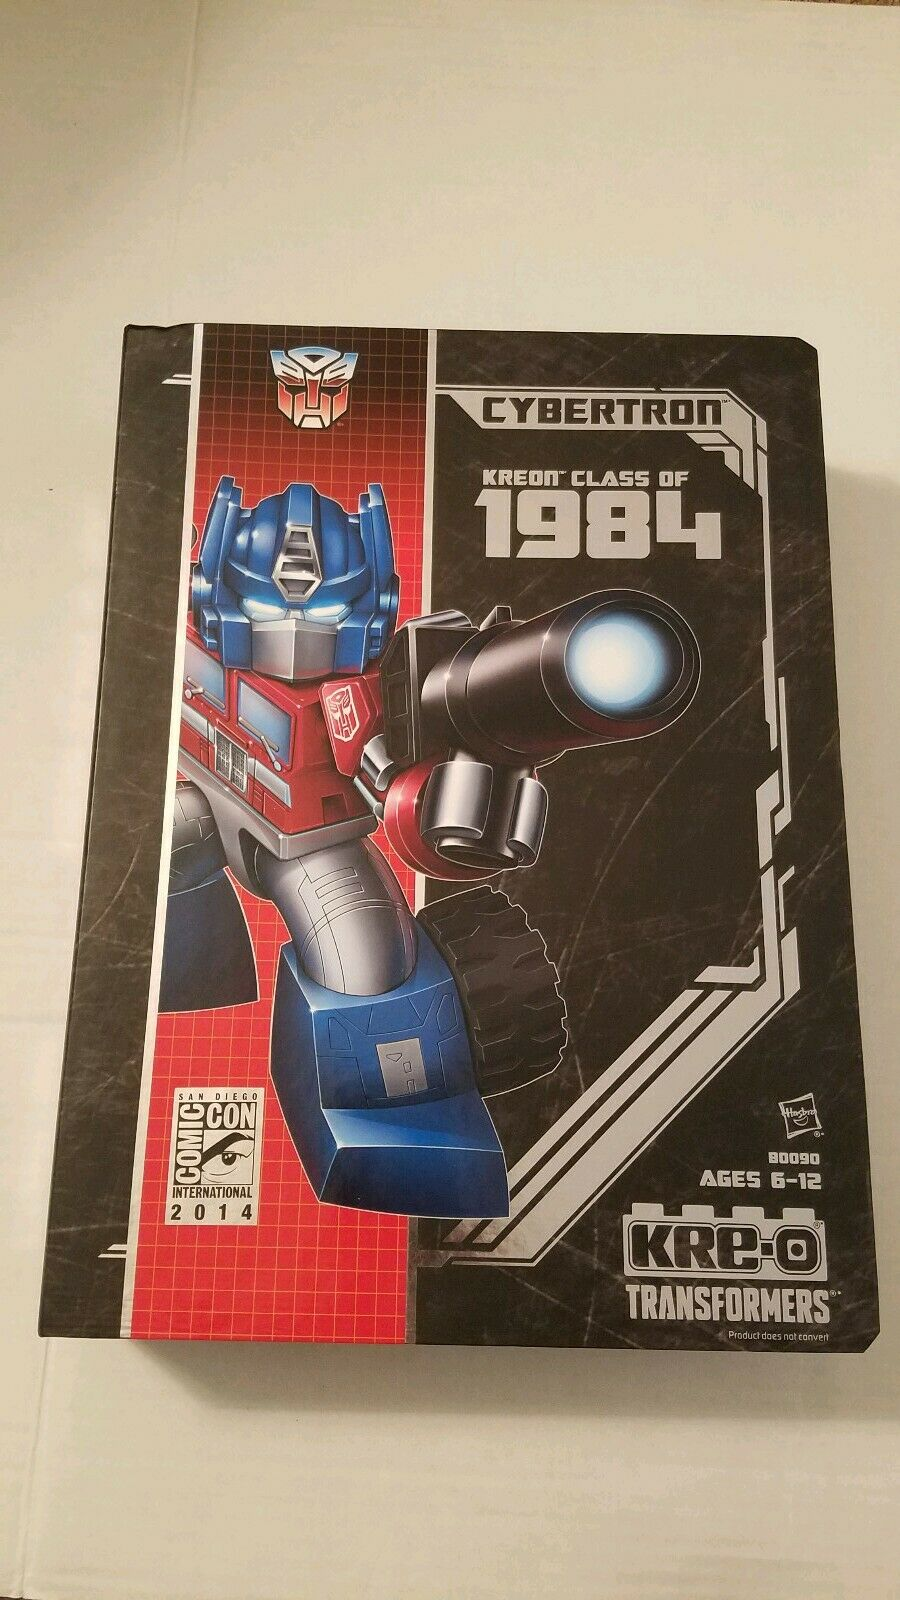 respuestas rápidas Sdcc 2014 Comic con Hasbro Kre-o Transformers Cybertron alta Kreon Kreon Kreon clase 1984  100% autentico